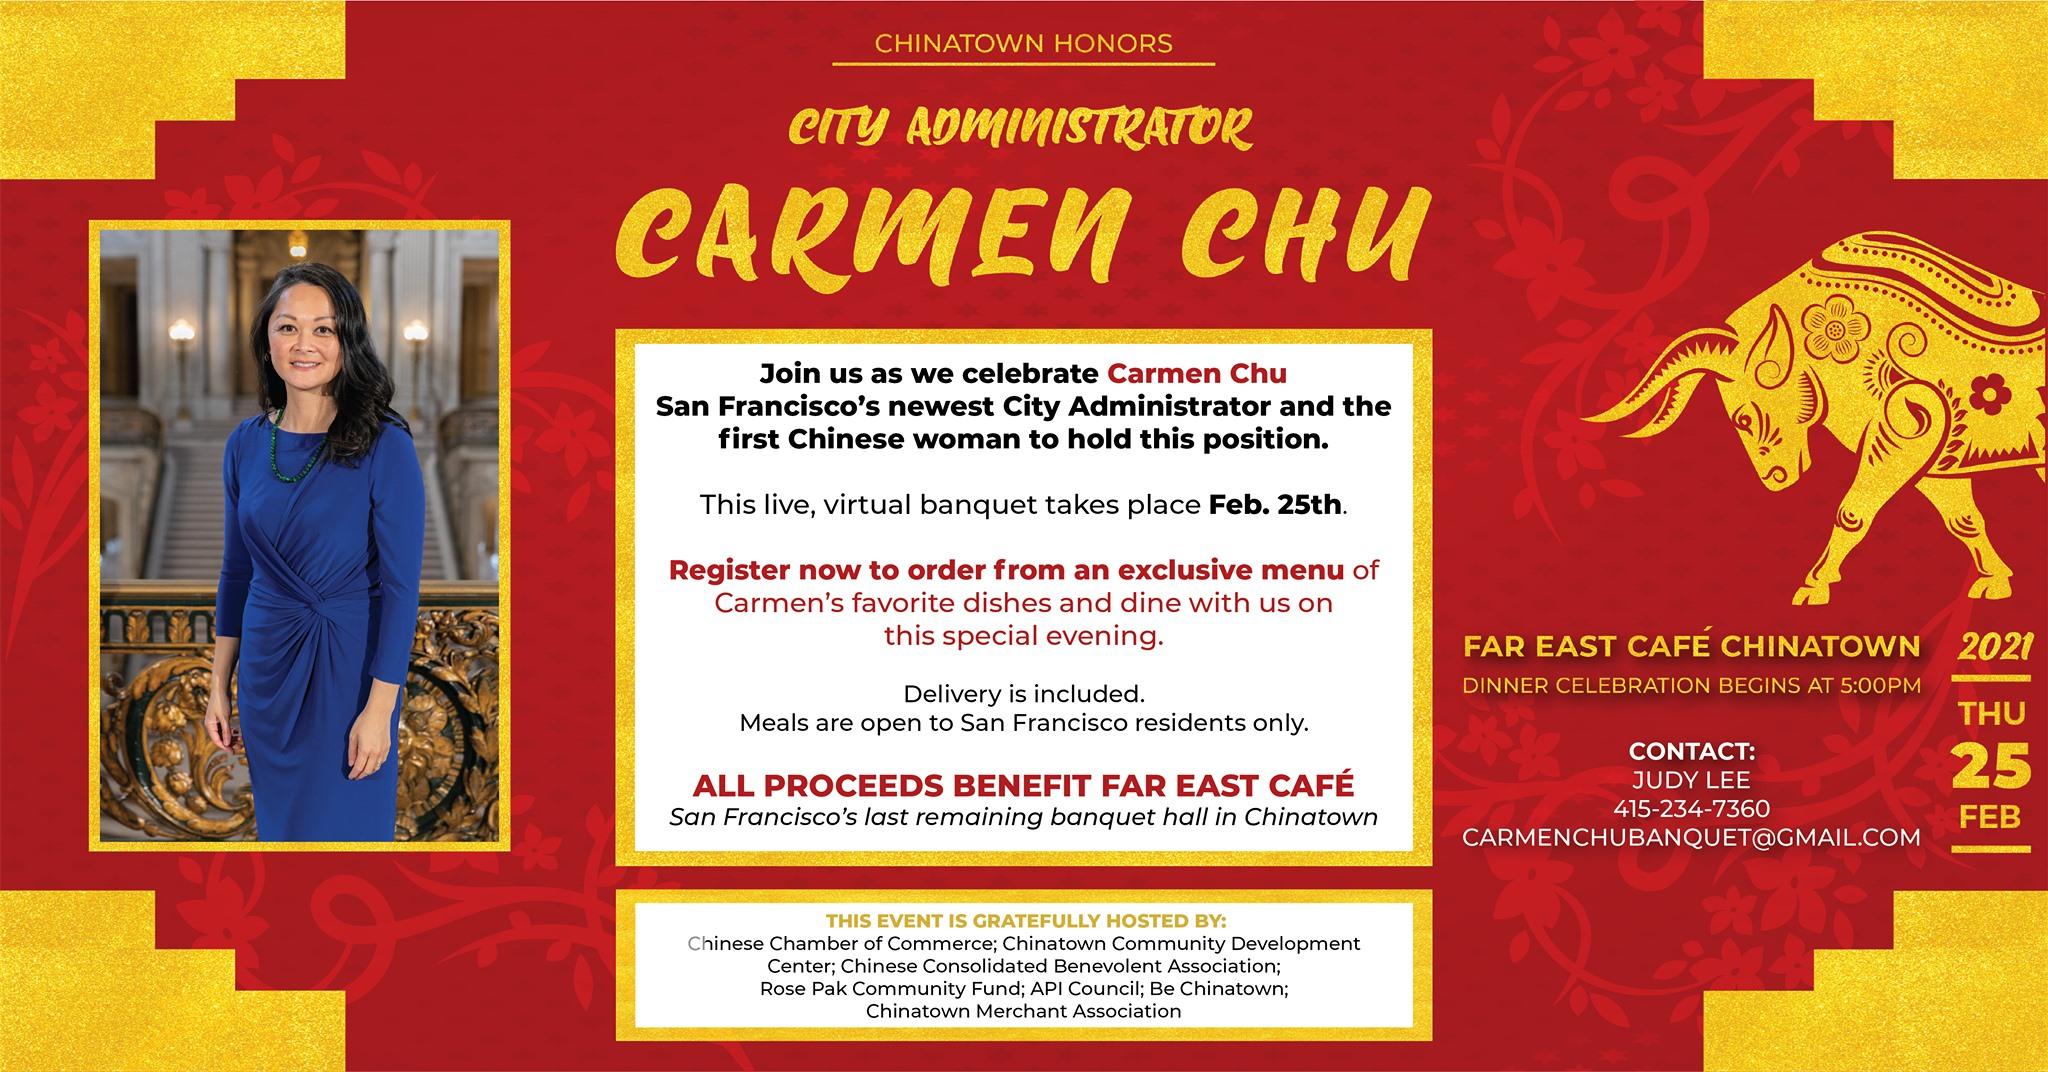 Feb 25: Chinatown Honors: City Administrator Carmen Chu Virtual Banquet